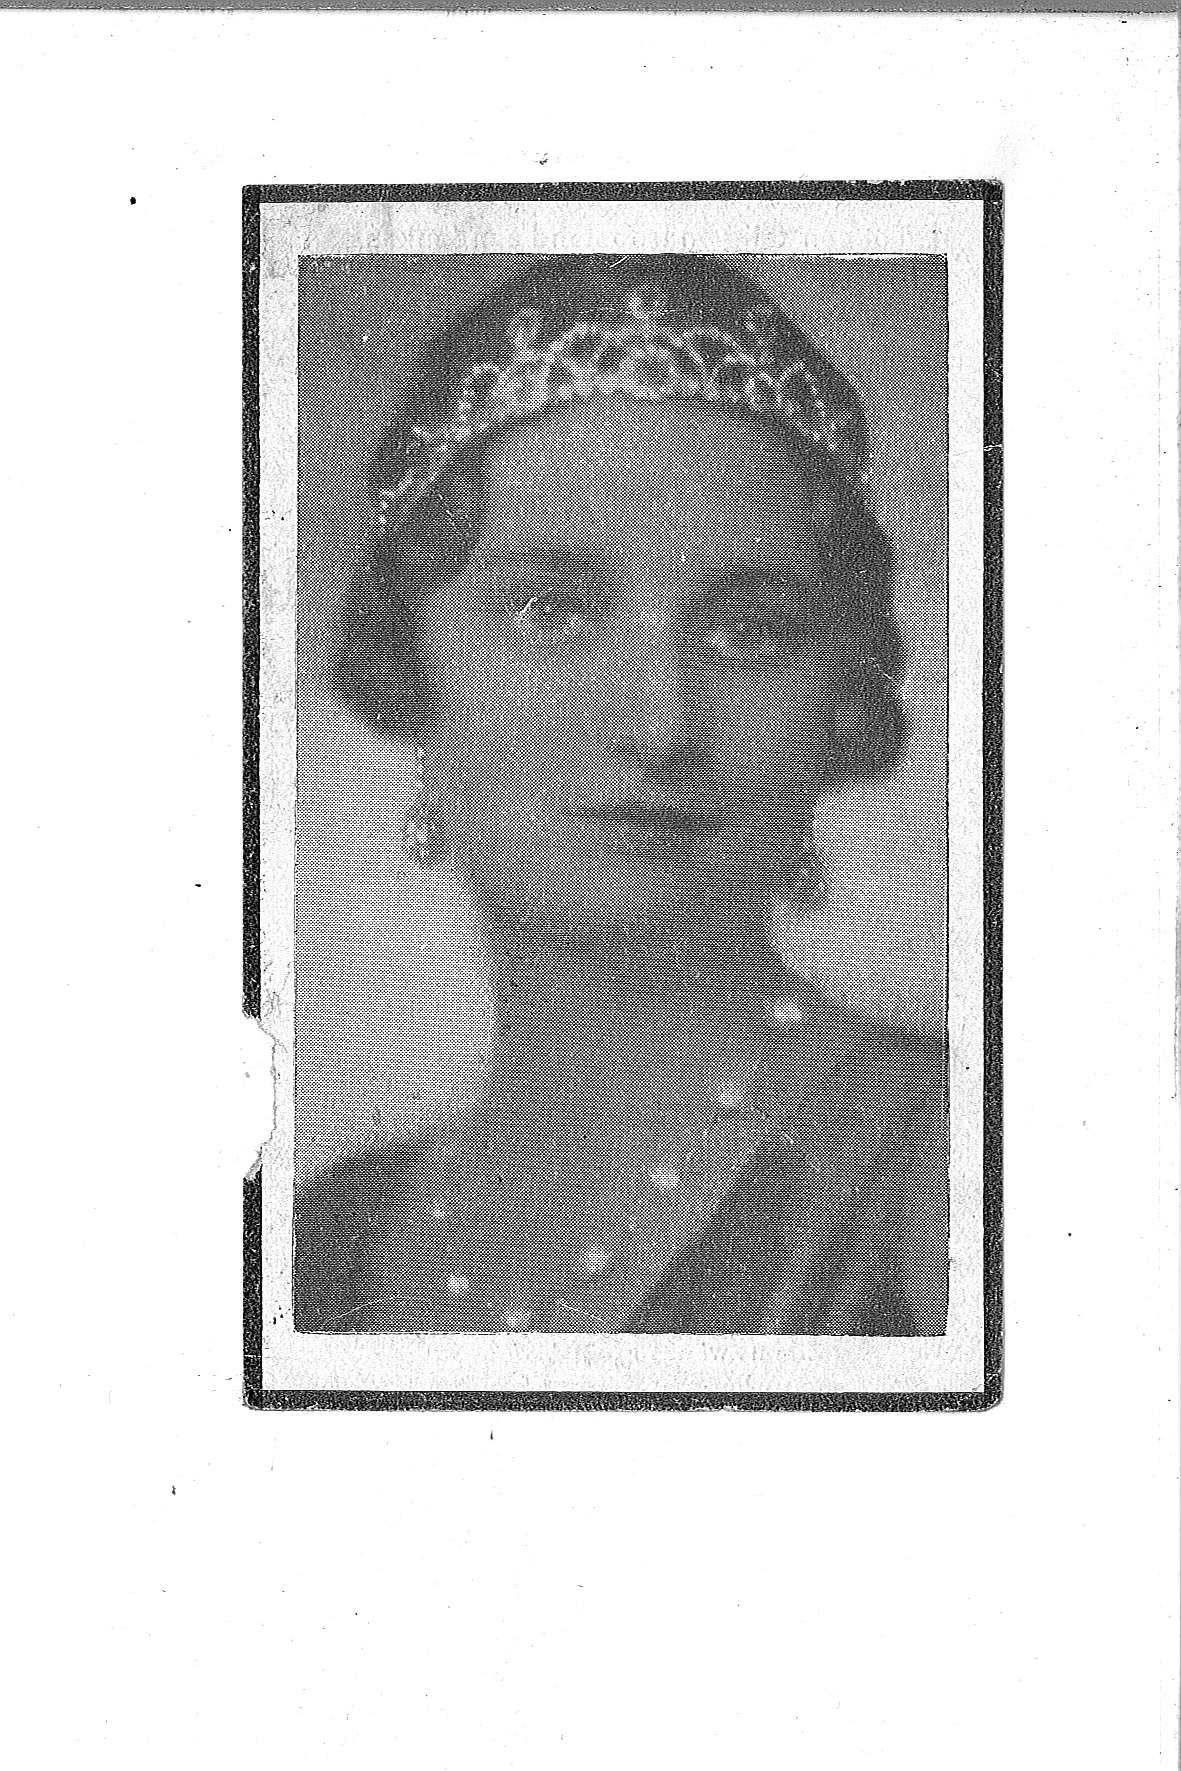 Astrid-Sophie-Louisa-Thyra(1935)20120614143819_00009.jpg